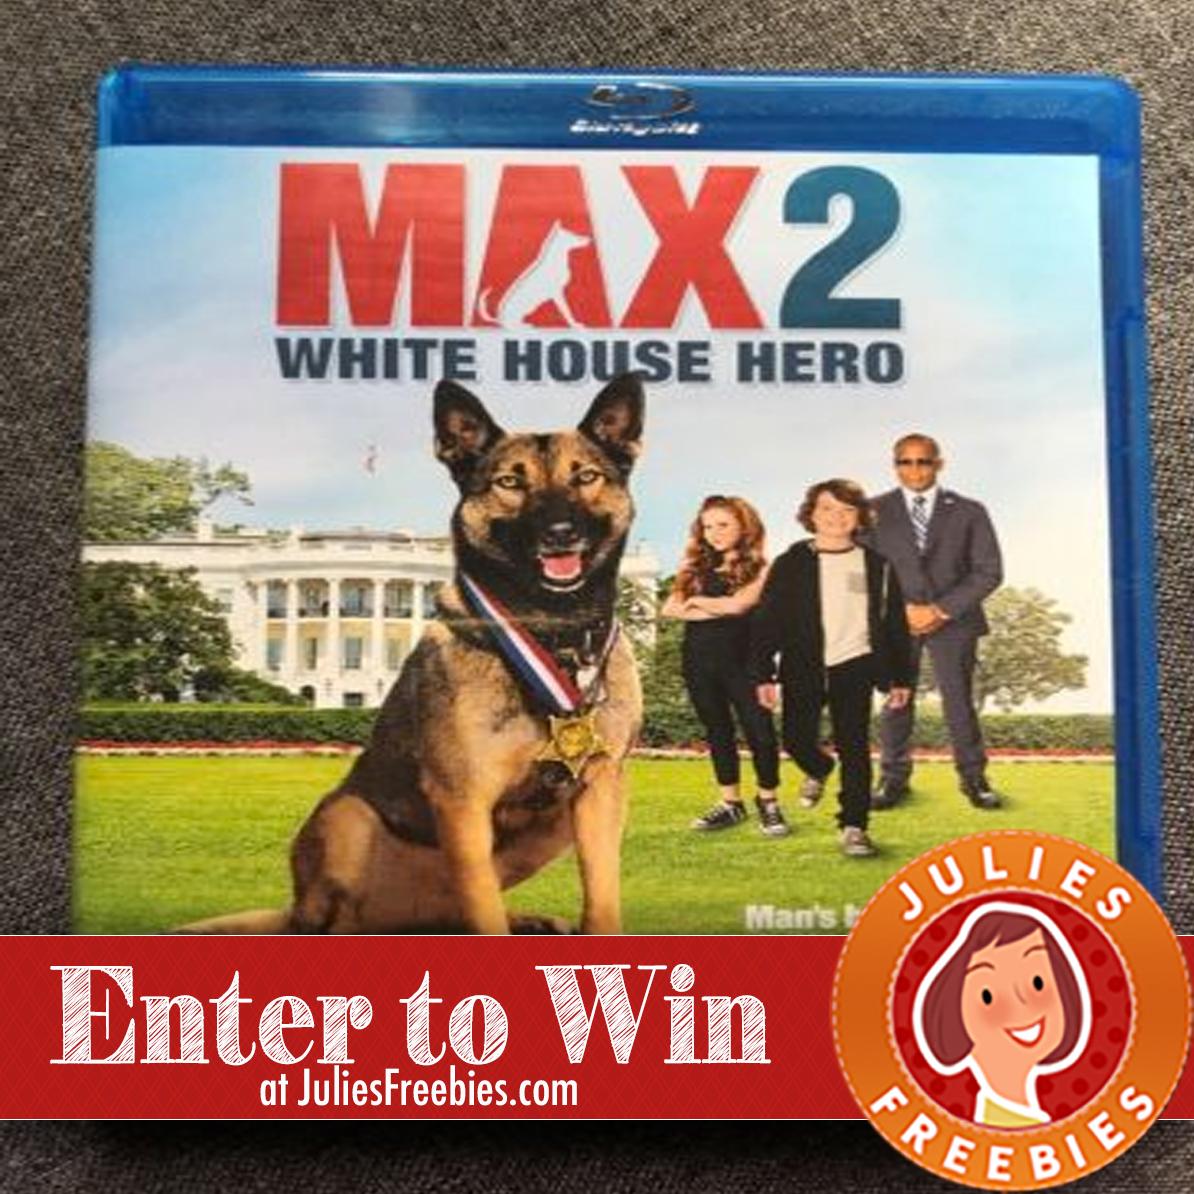 Max 2: White House Hero Sweepstakes - Julie's Freebies